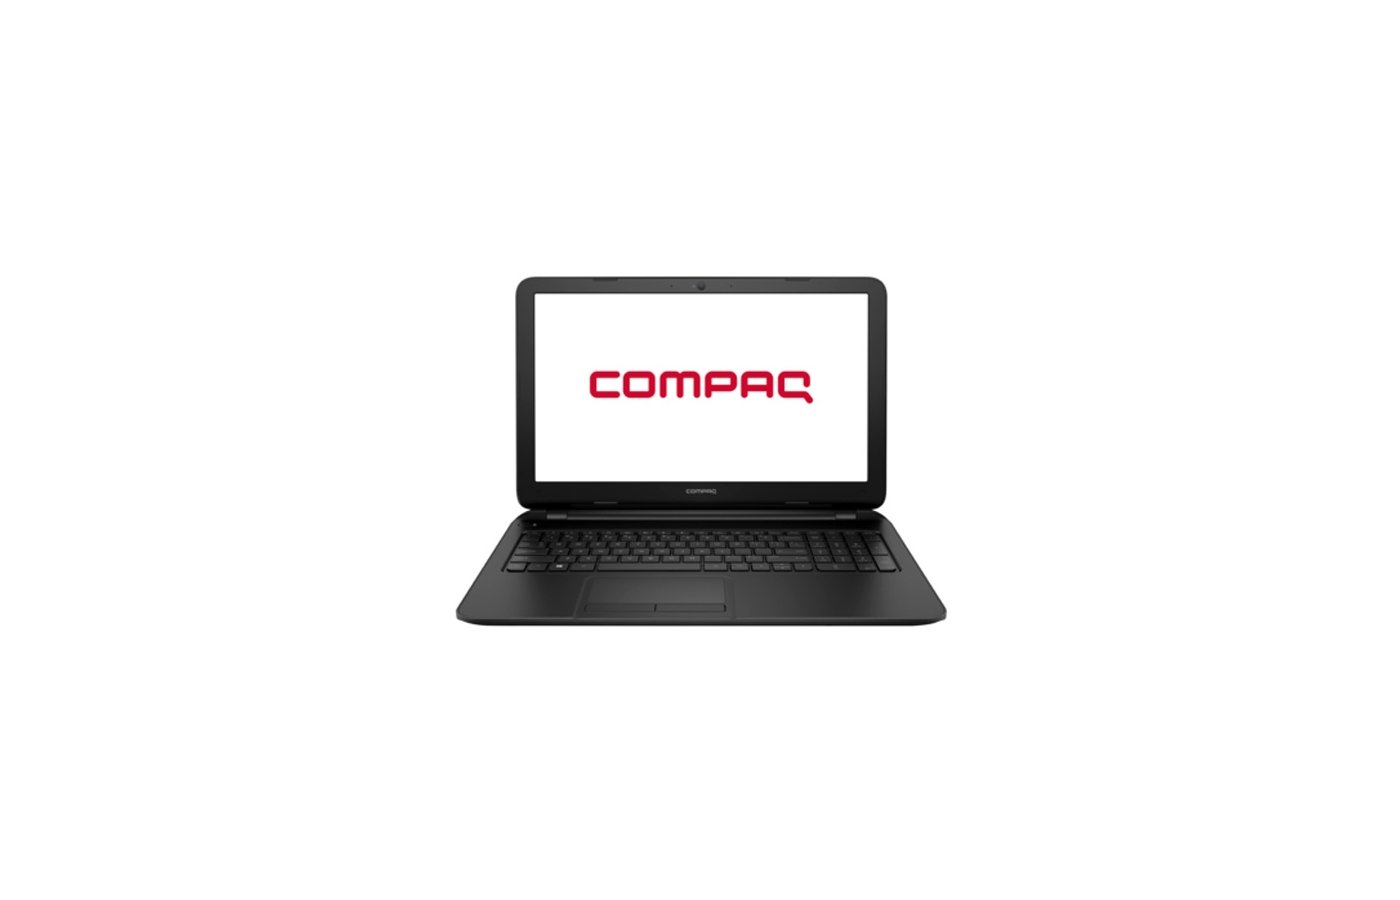 Ноутбук Compaq 15-f100UR /M7U98EA/ intel N2840/2Gb/500Gb/DVDRW/15.6/Win8